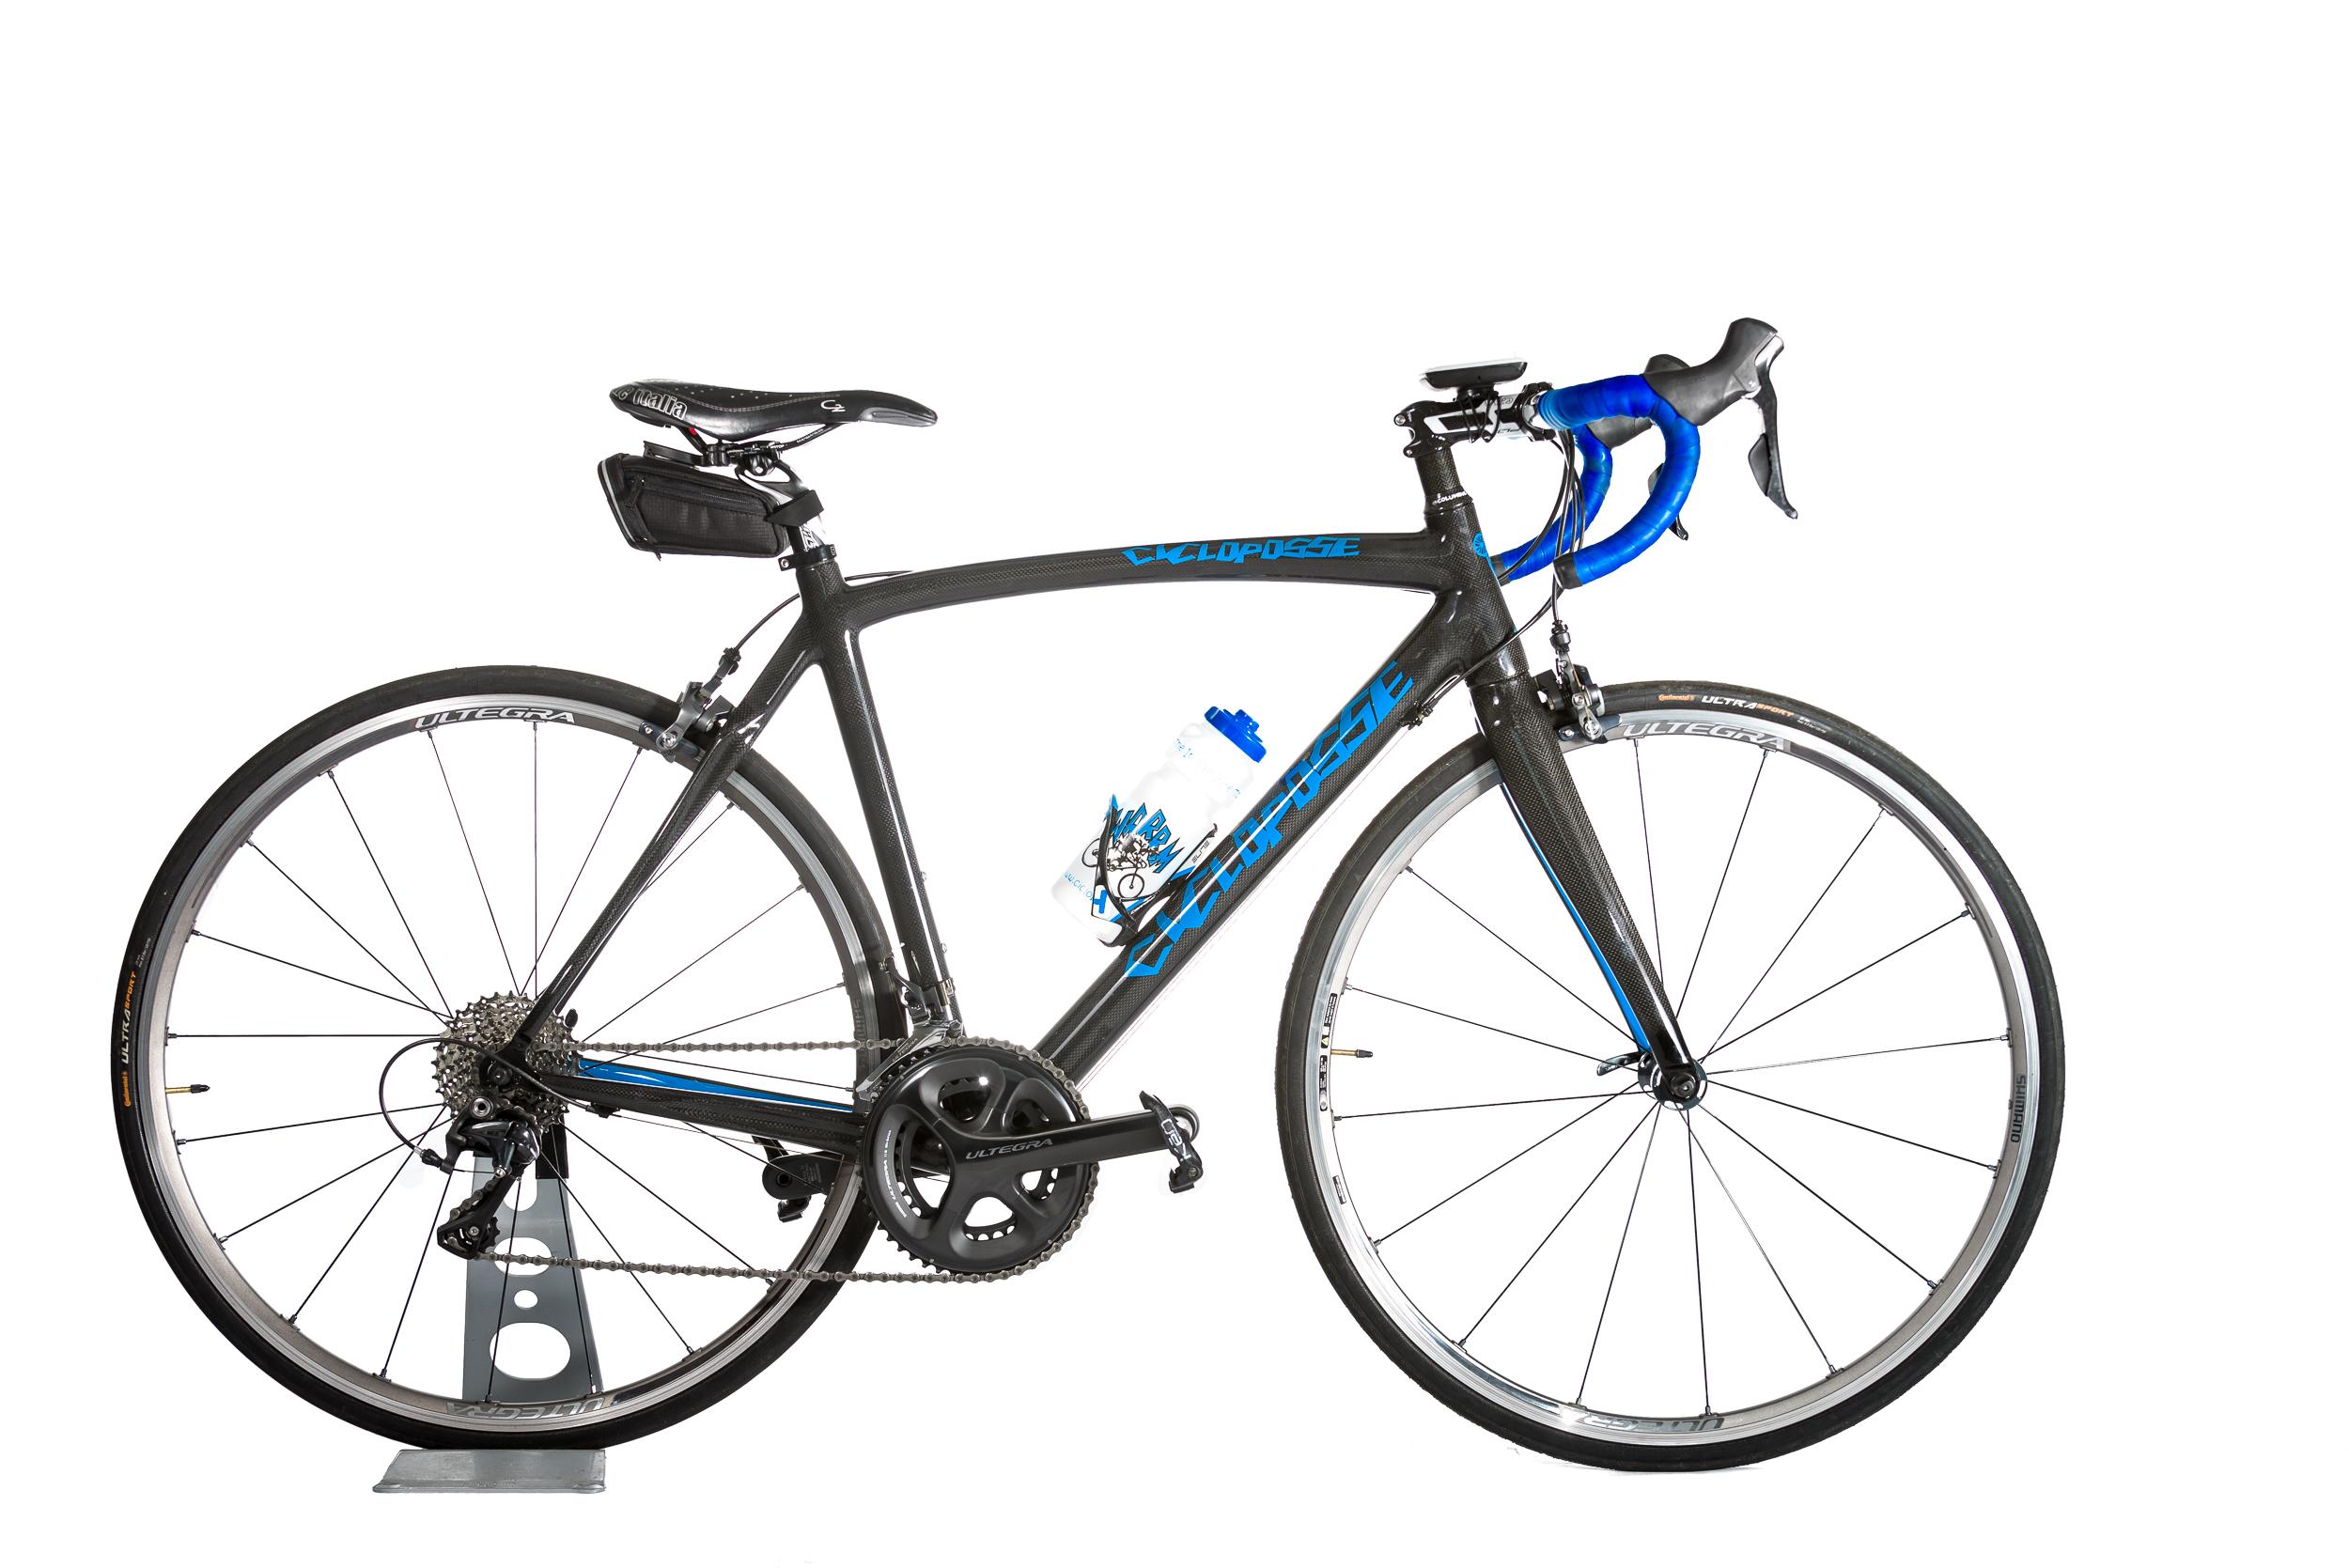 bici corsa noleggio val dorcia